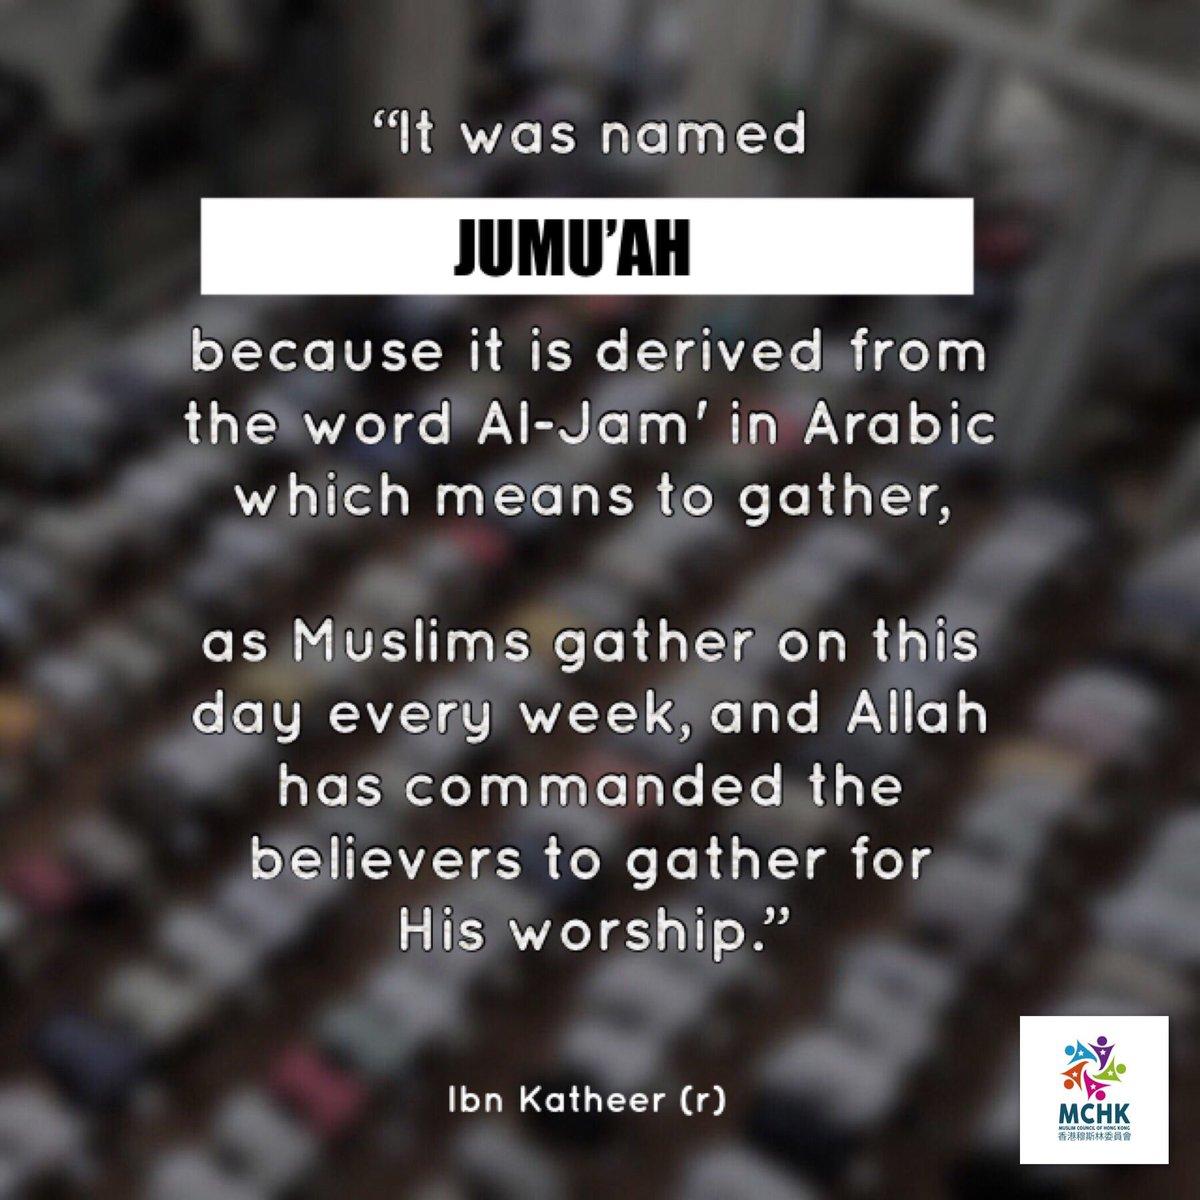 Muslim Council HK on Twitter: